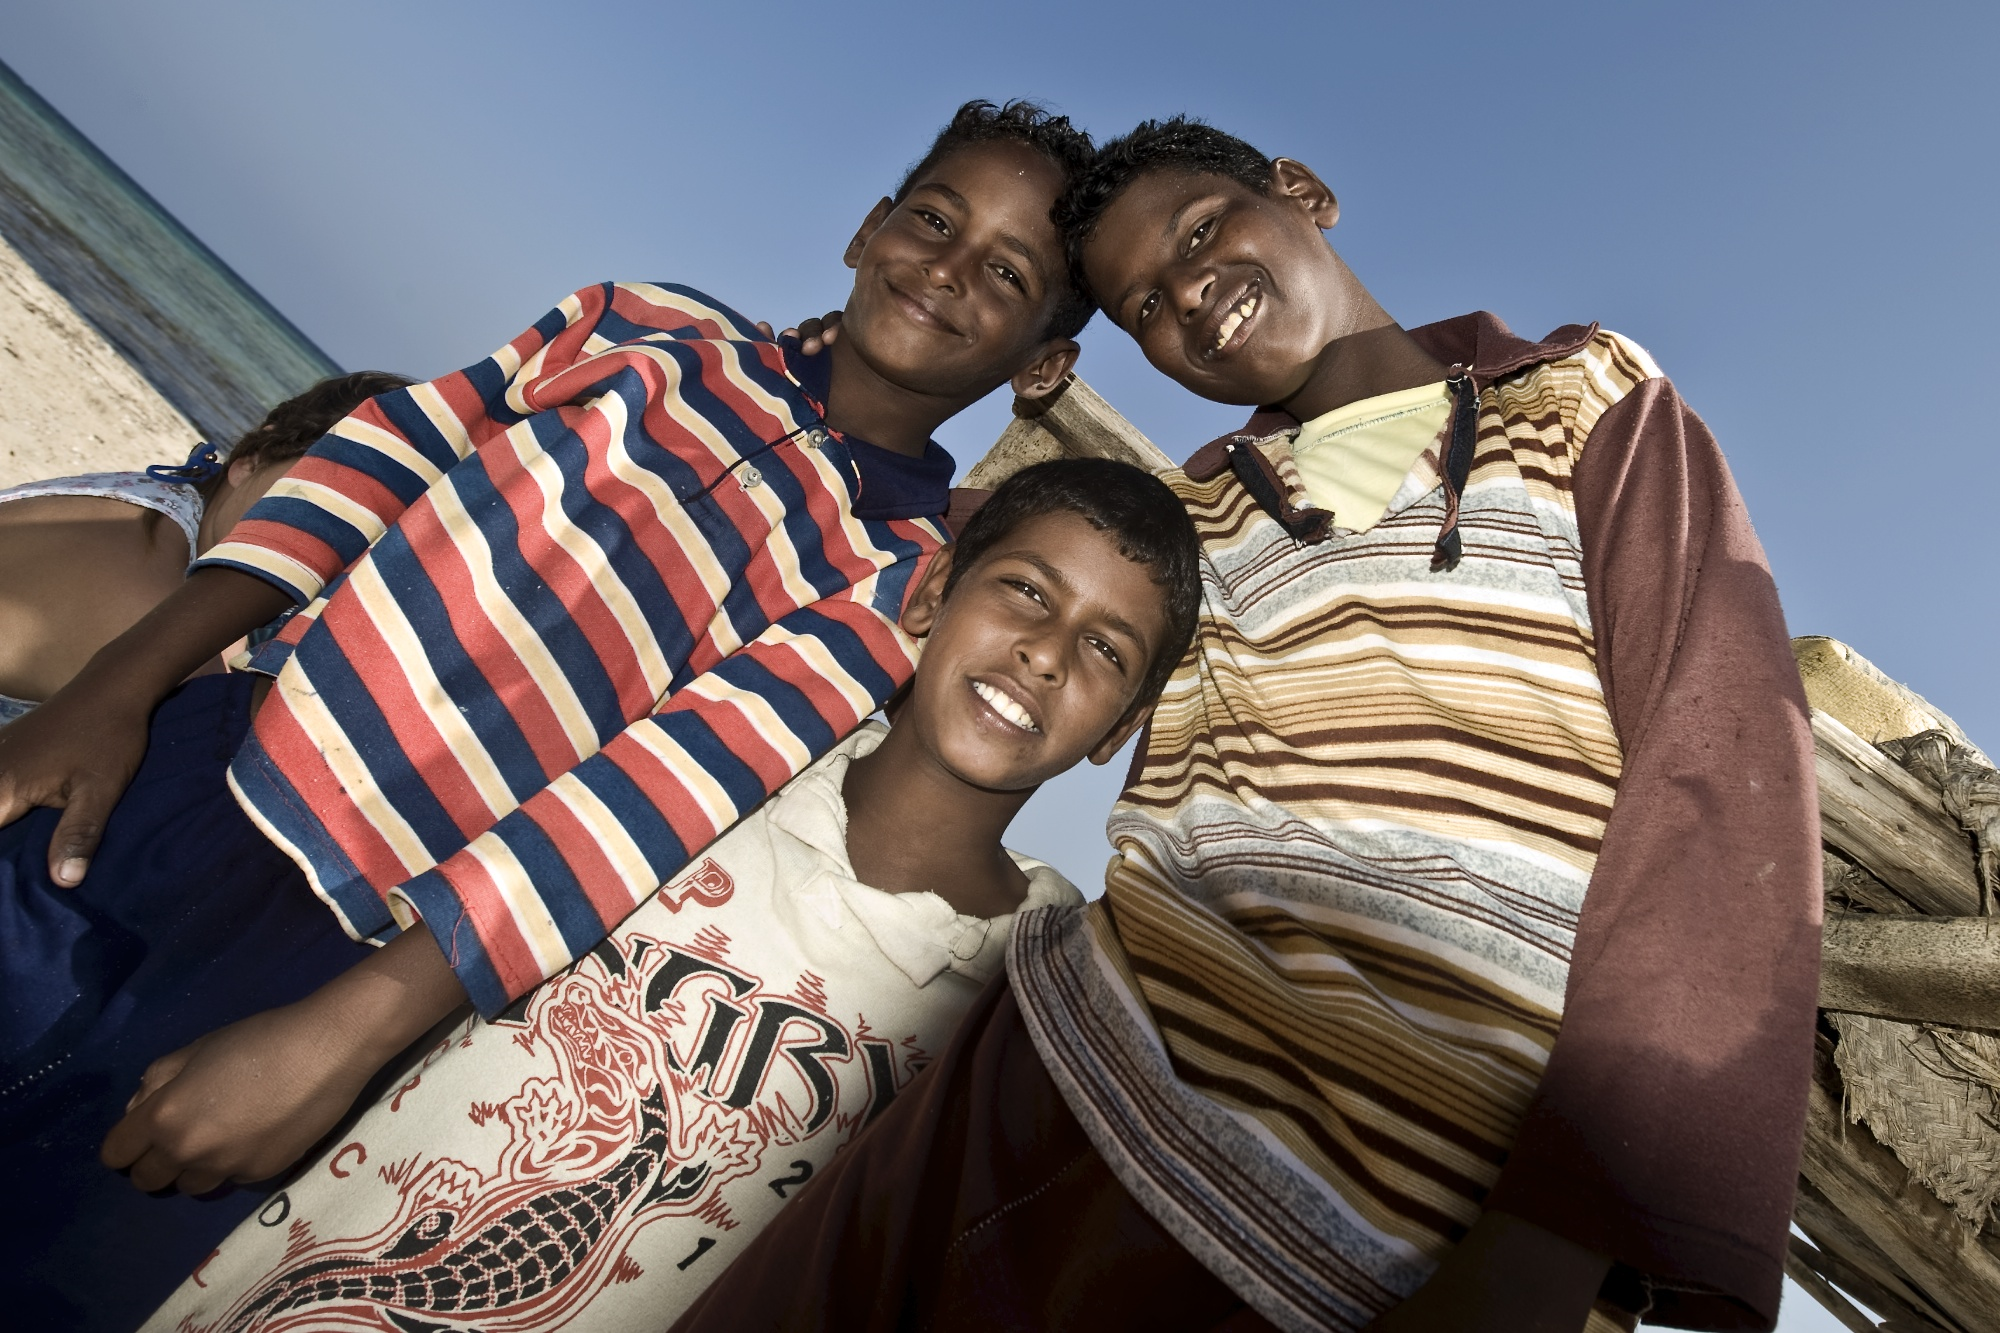 Beduin Boys, Abu Ghusun, southern Egypt